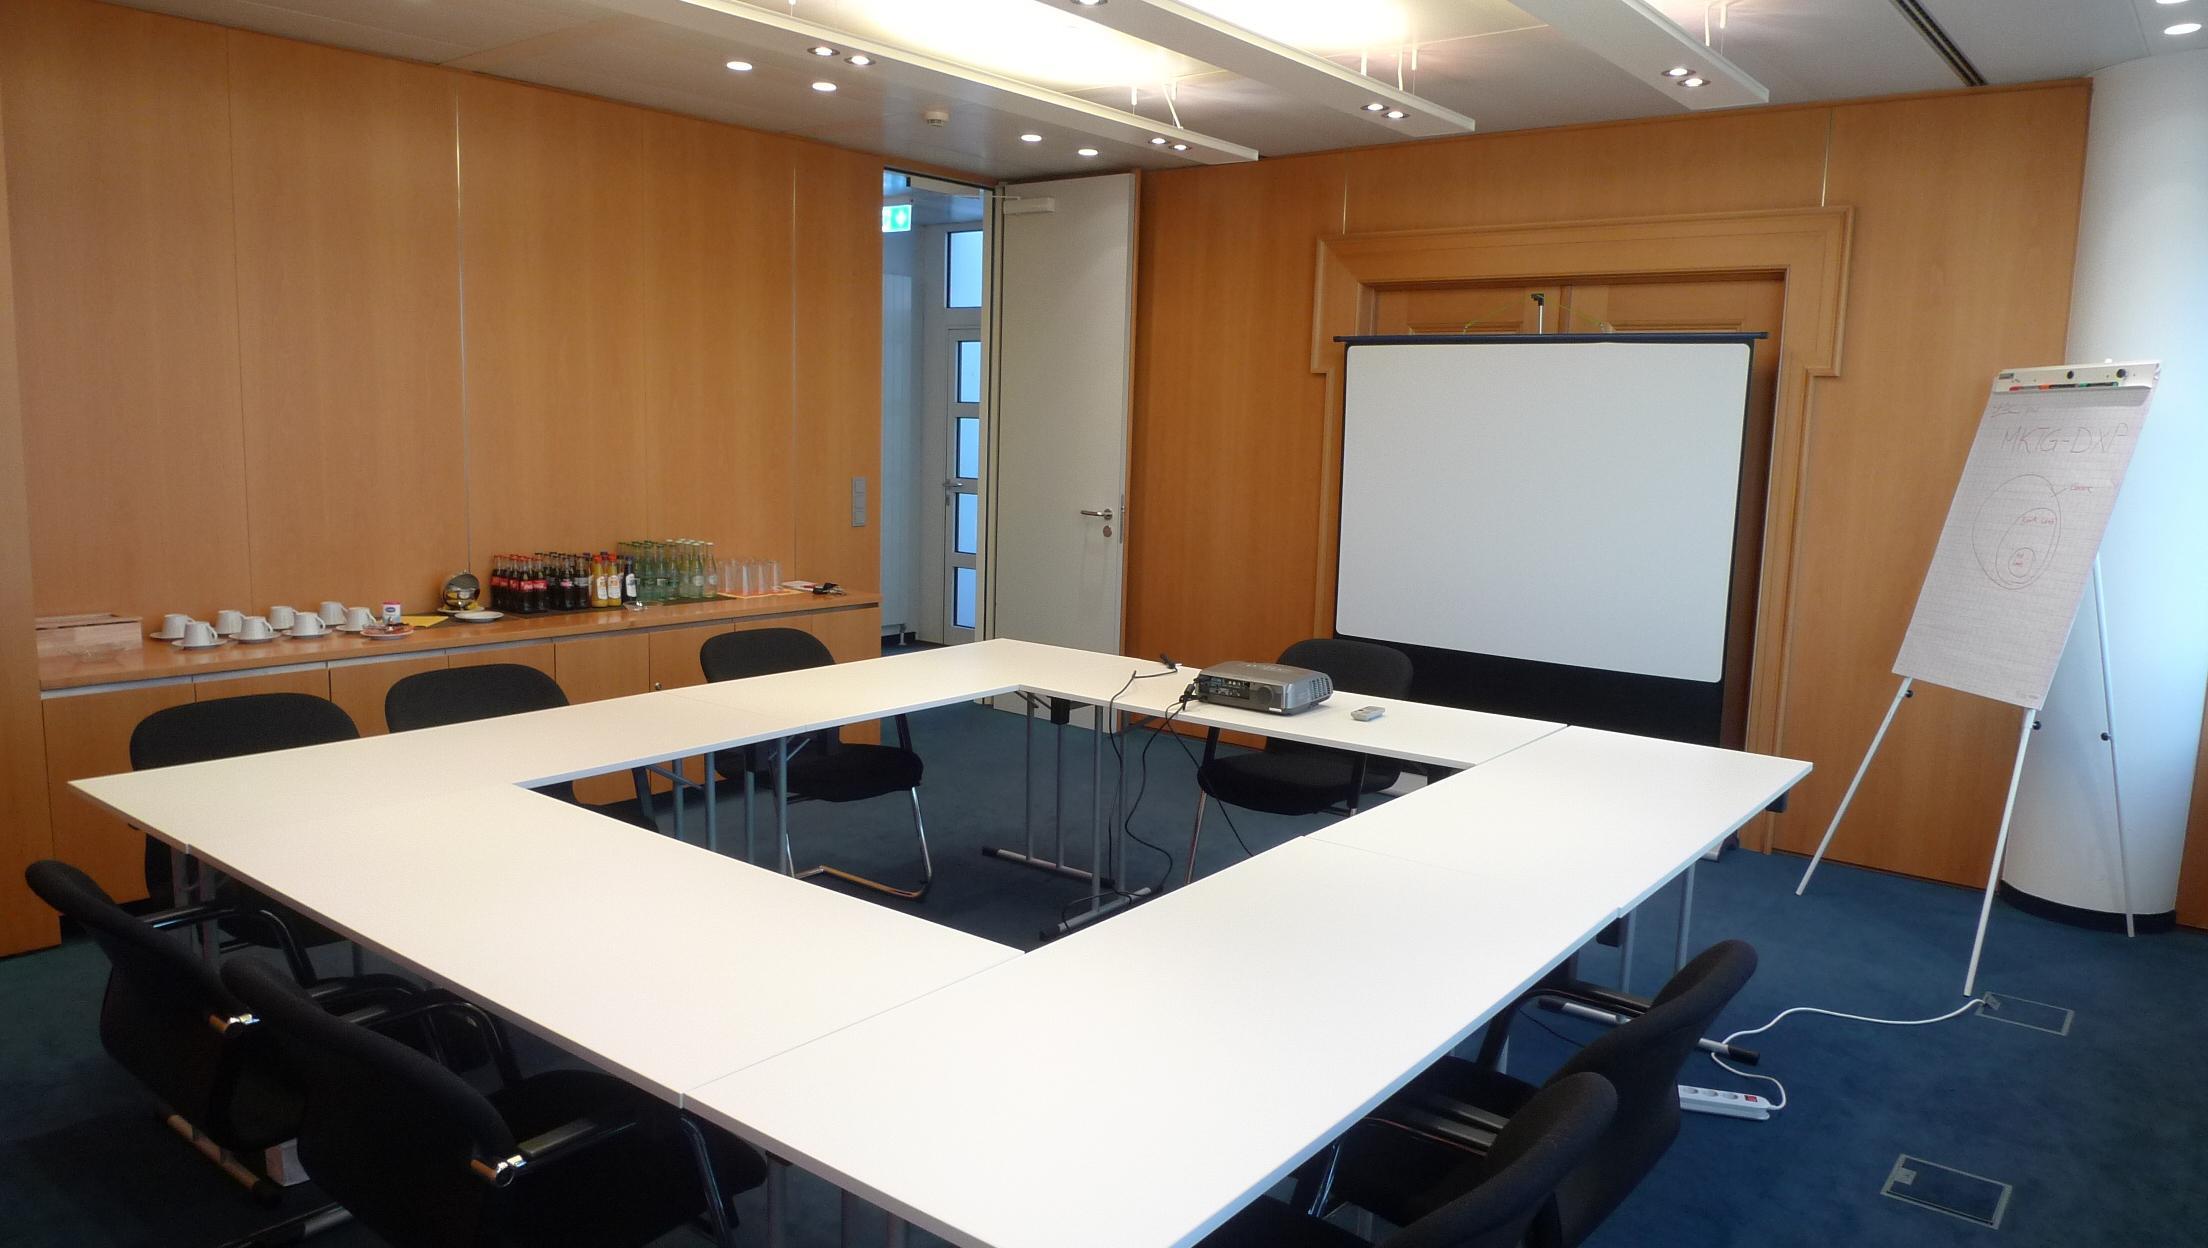 ecos office center frankfurt eschborn mieten in eschborn. Black Bedroom Furniture Sets. Home Design Ideas